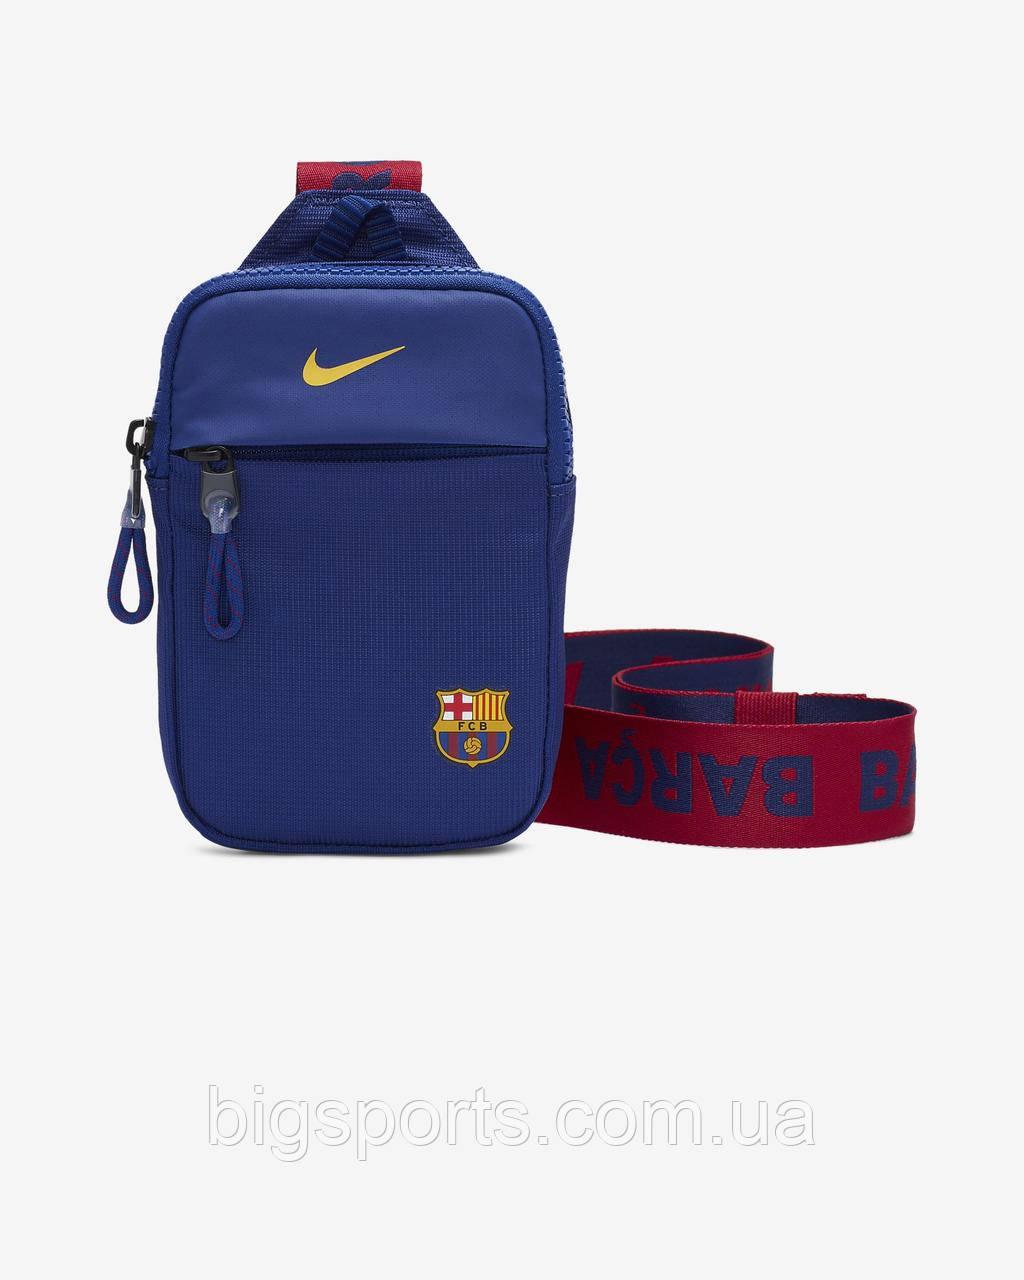 Сумка спортивная через плечо муж. Nike FC Barcelona Stadium Smit (арт. CK6487-421)